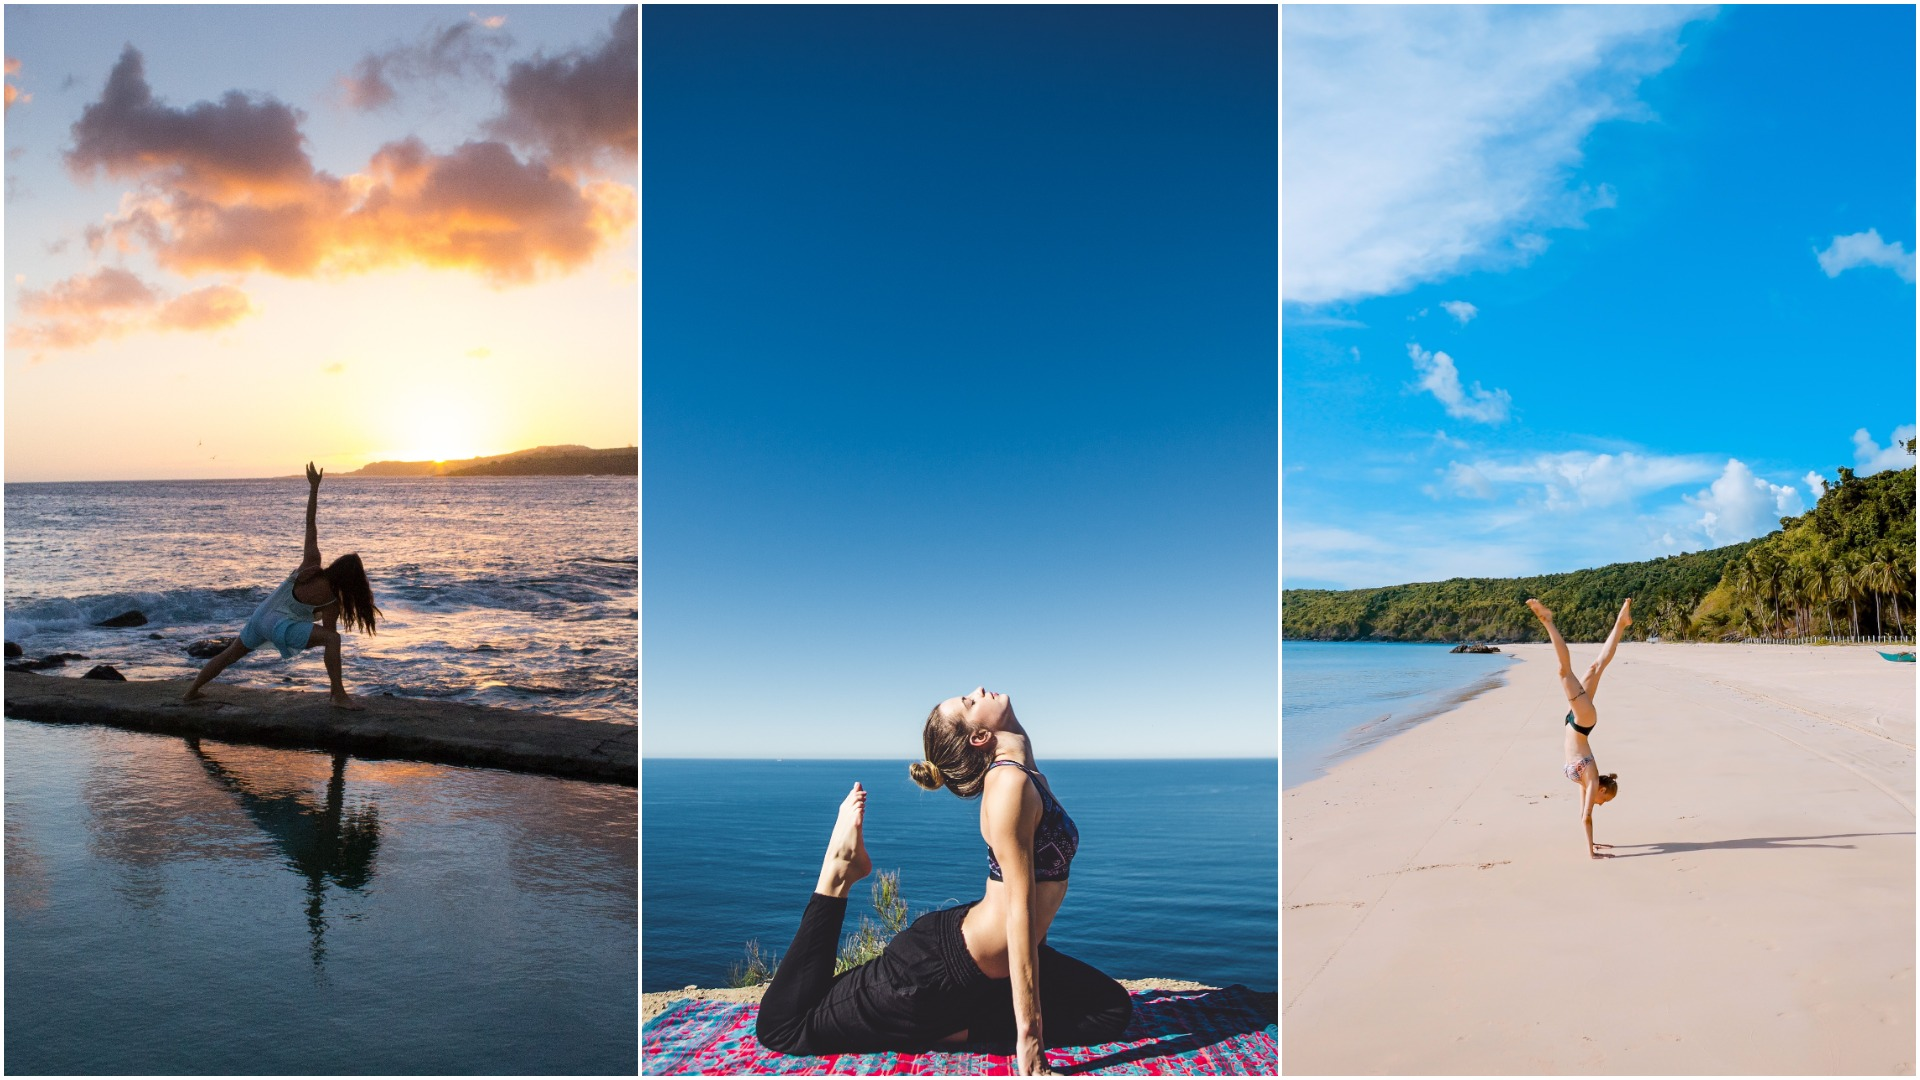 Instagram yoga poses | © Unsplash